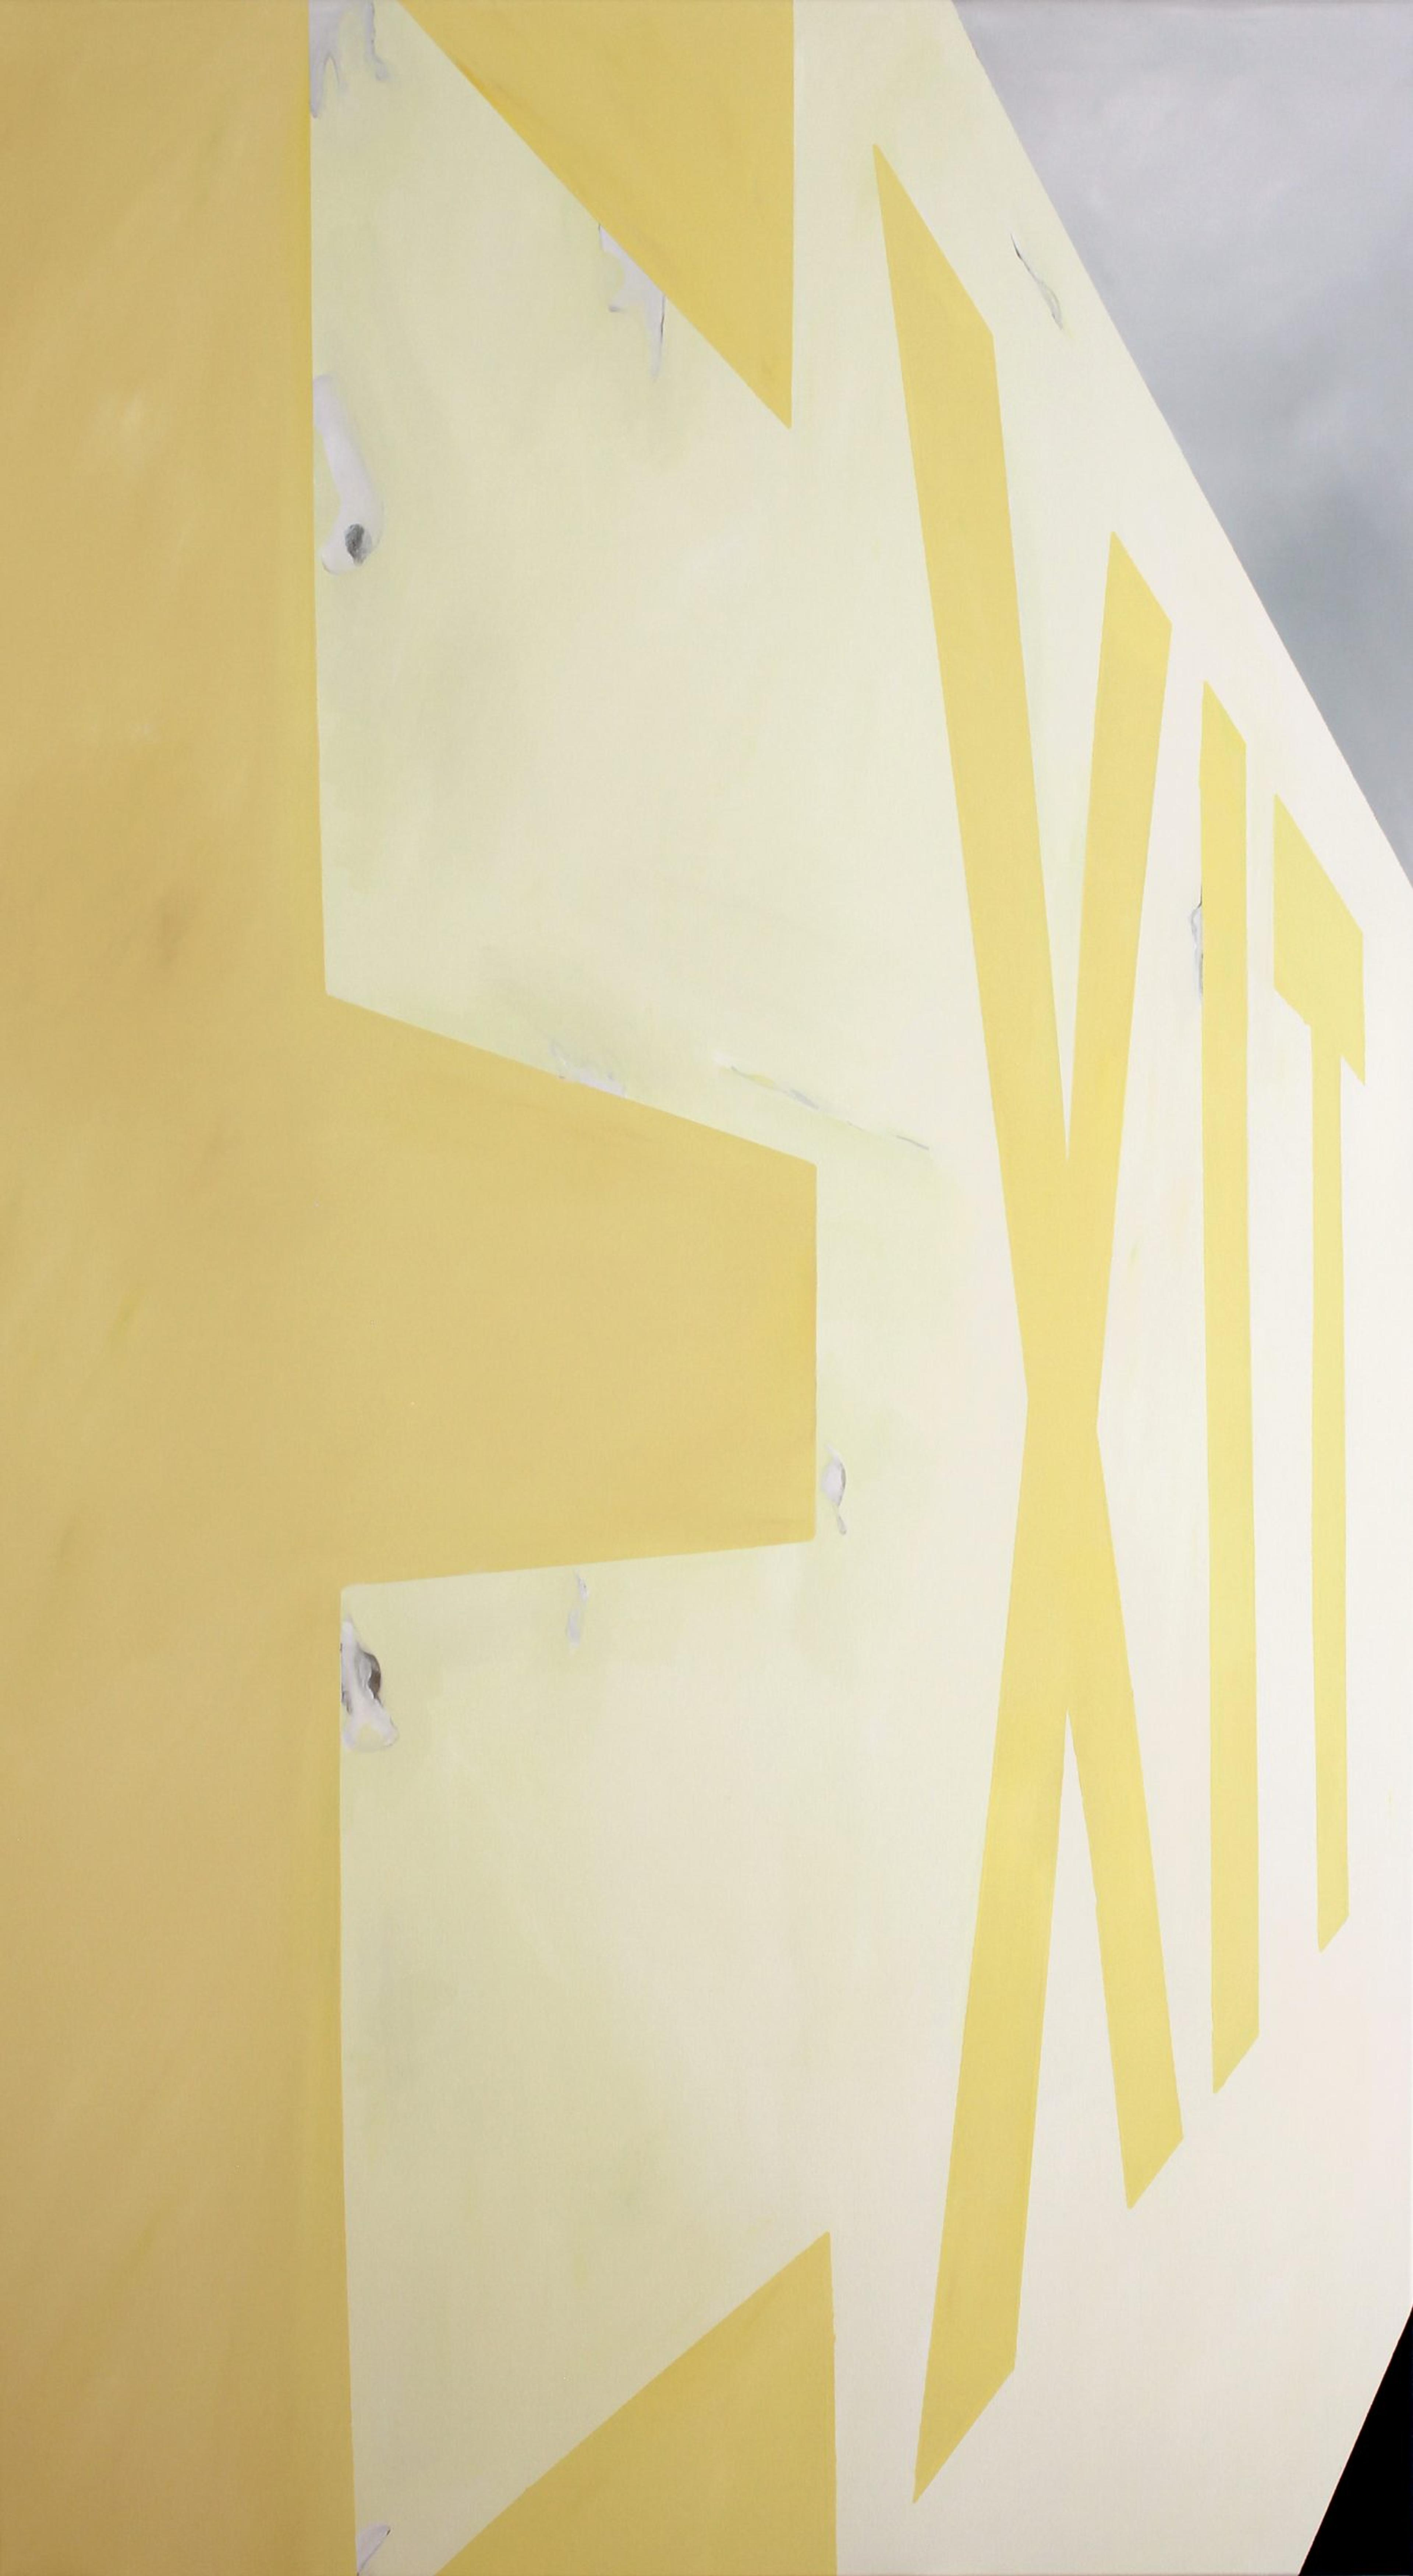 artwork EXIT wall by Joana Lucas